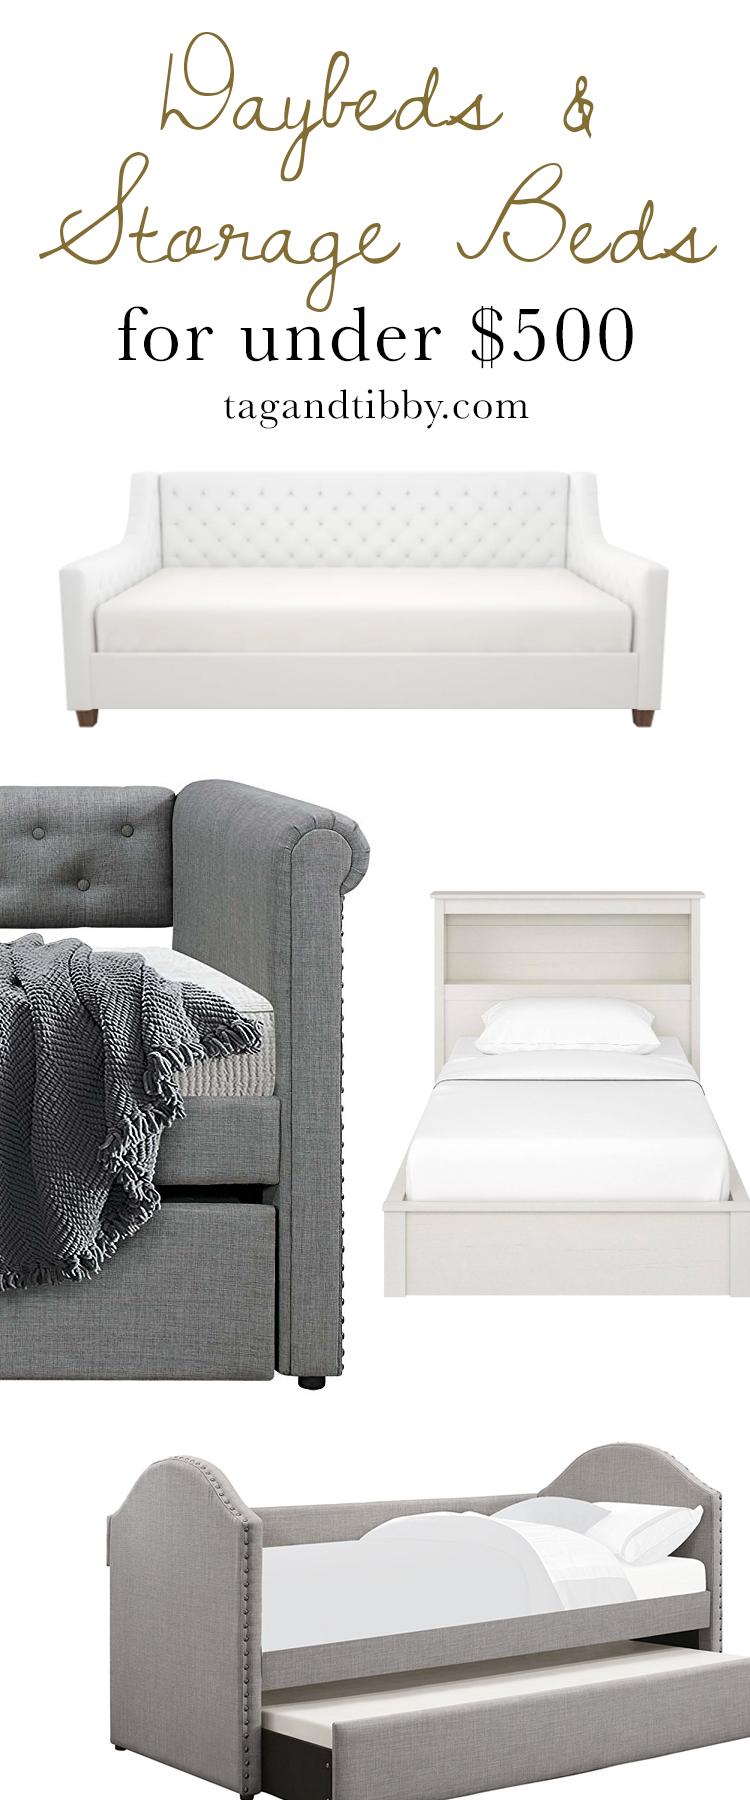 Daybeds & Storage Beds for Tweens priced under $500